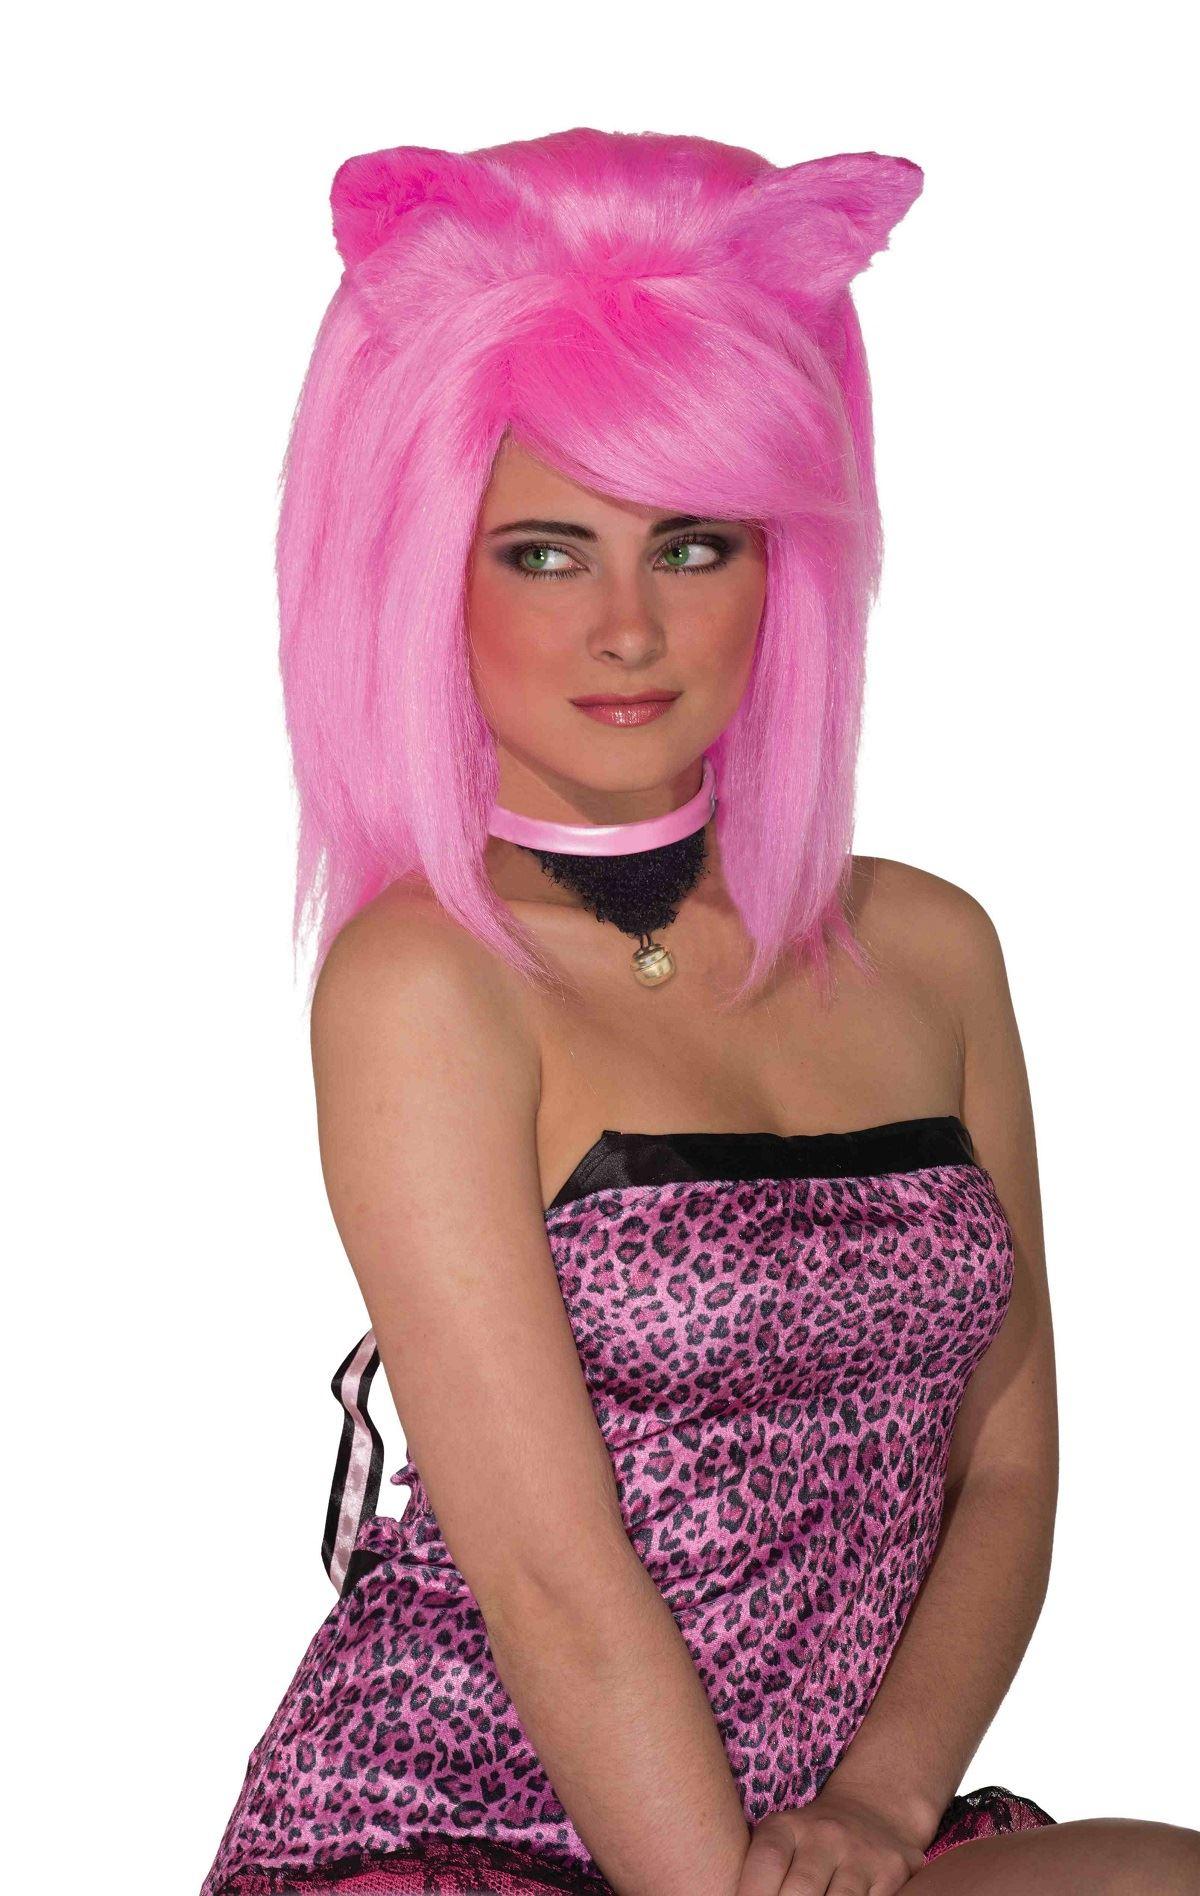 Adult Feline Fantasy Women Hot Pink Wig  sc 1 st  The Costume Land & Adult Feline Fantasy Women Hot Pink Wig | $26.99 | The Costume Land